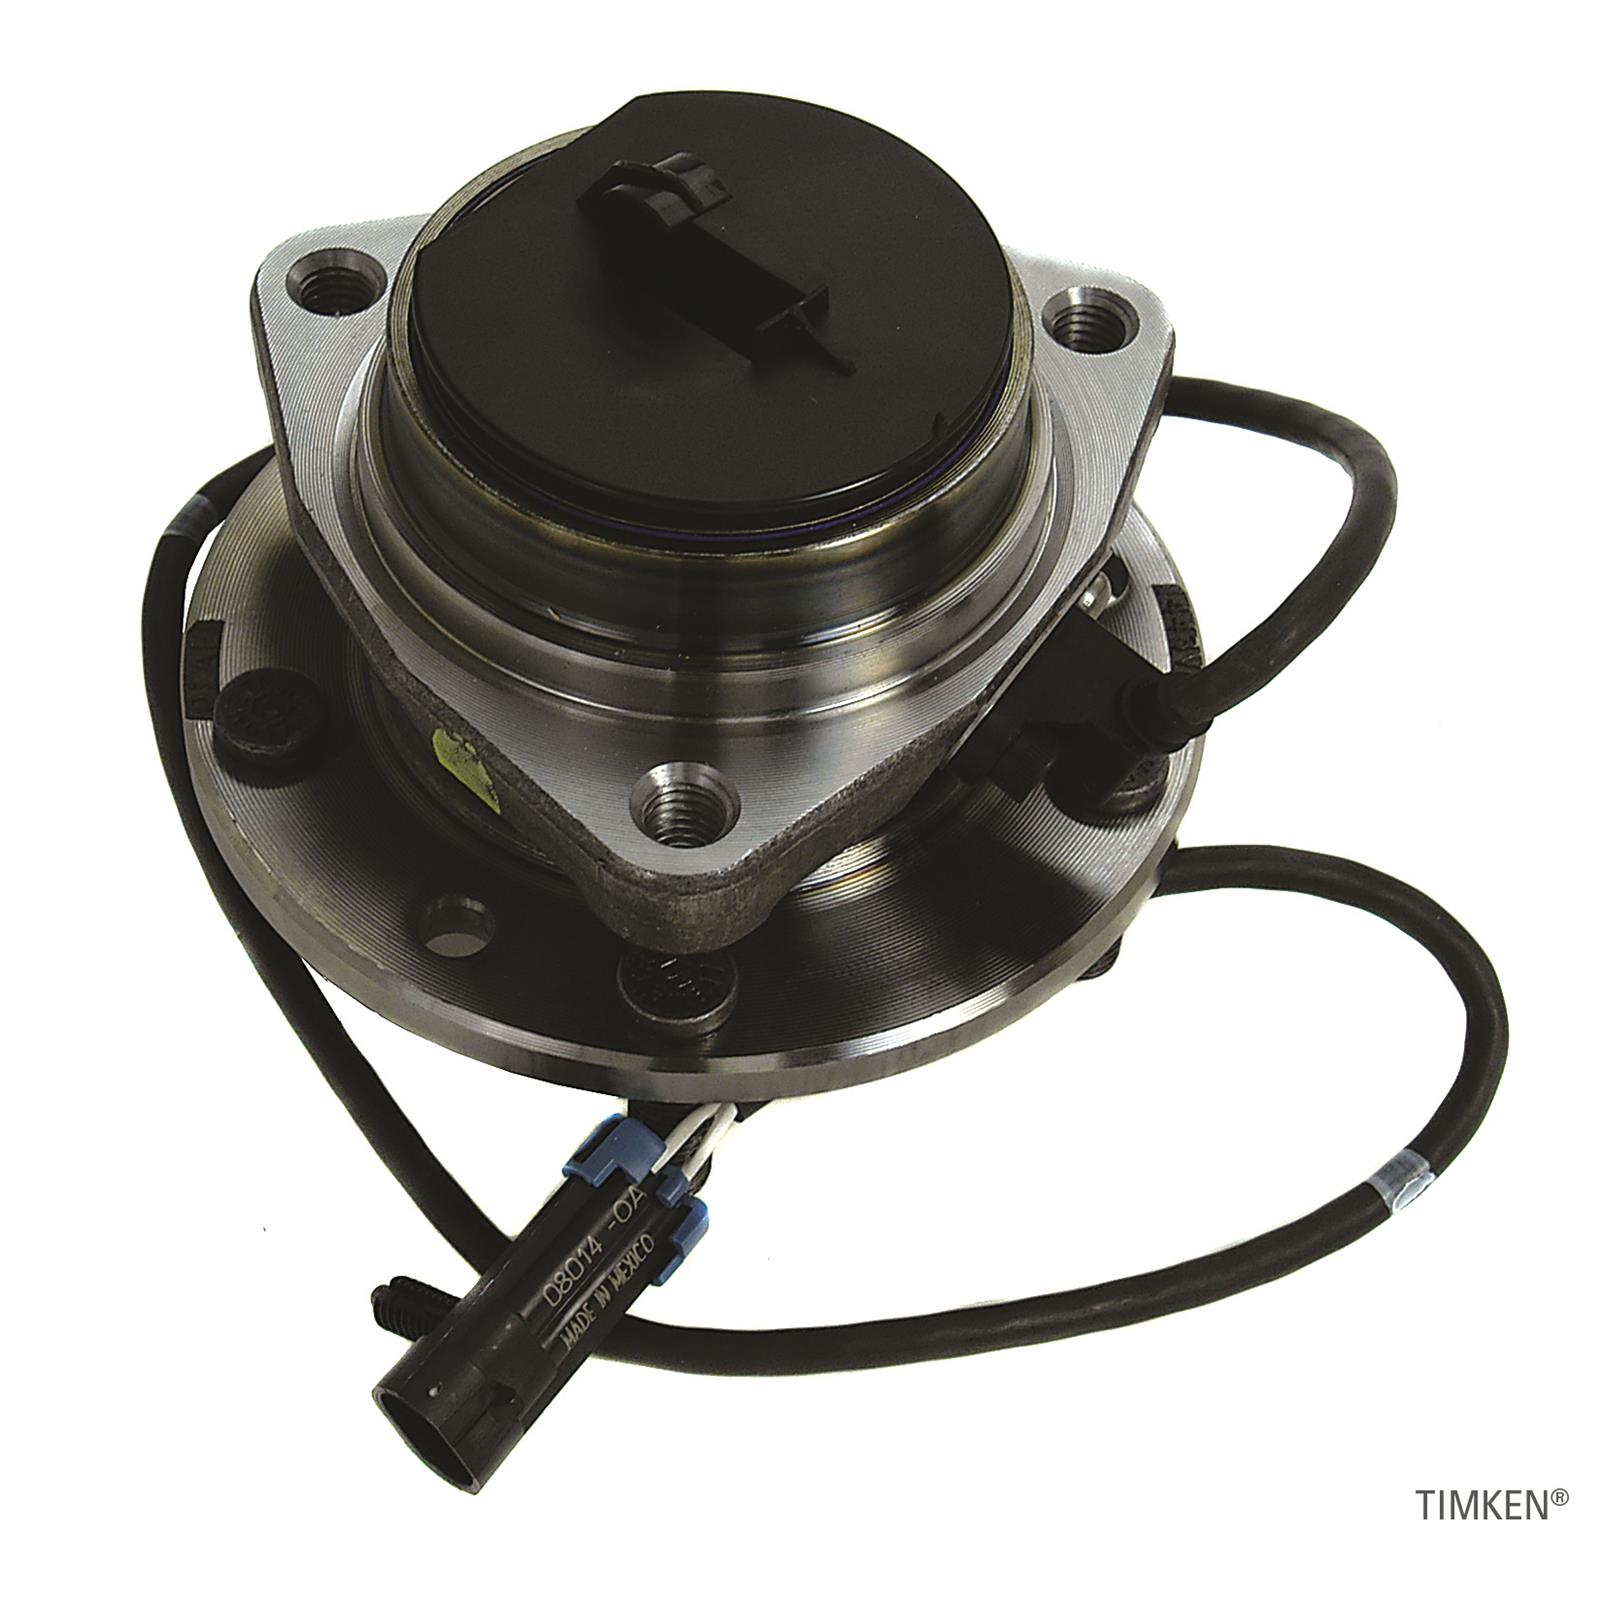 CHEVROLET S10 Timken Wheel Bearing and Hub Assemblies 513124